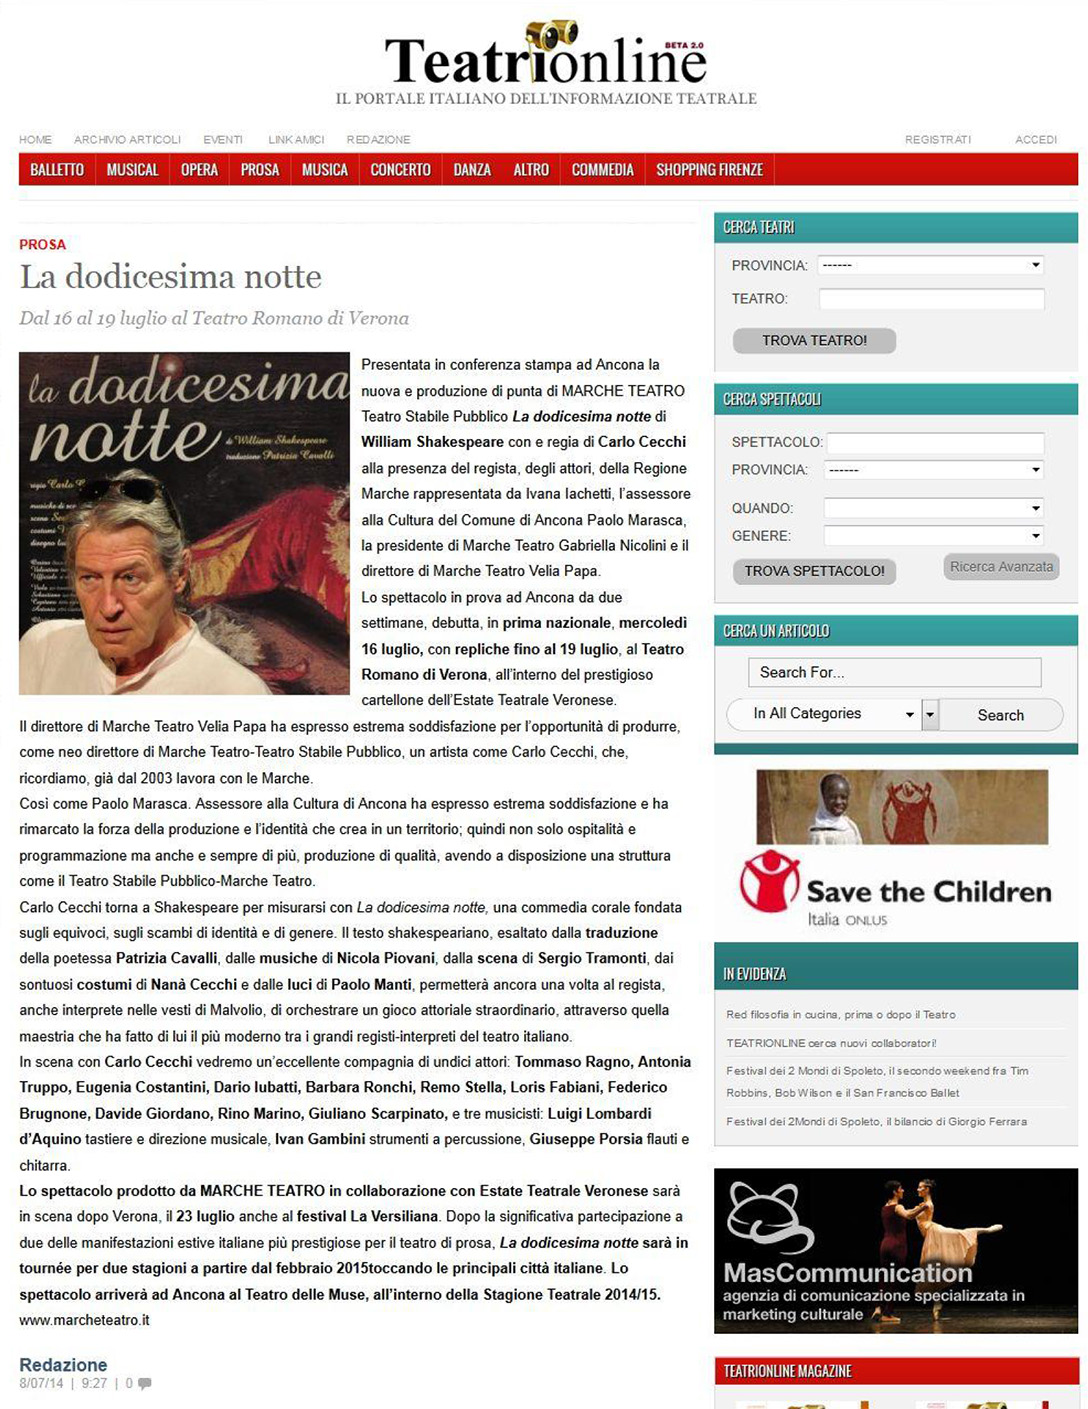 2014.07.08 La dodicesima notte - teatrionline.com